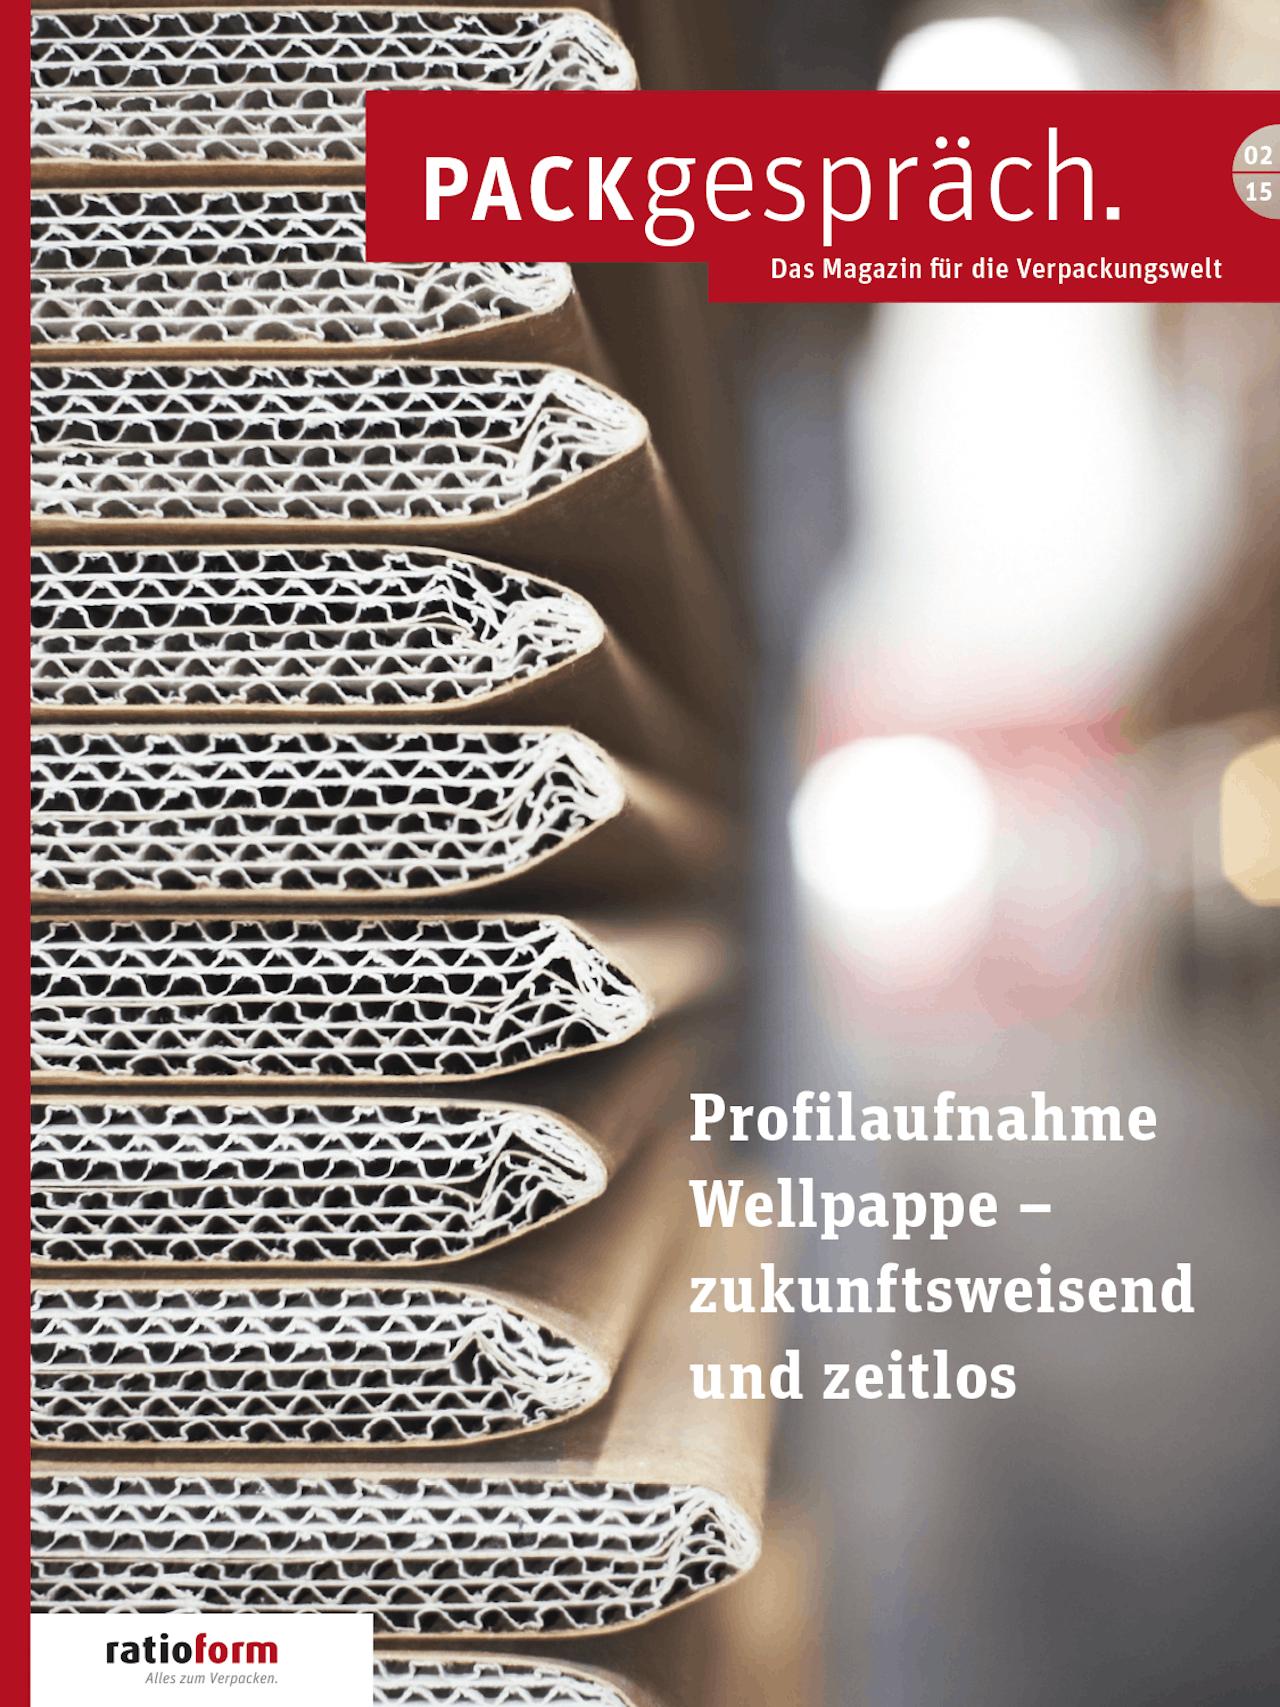 Packgespräch, Magazin Verpackungswelt 02 15